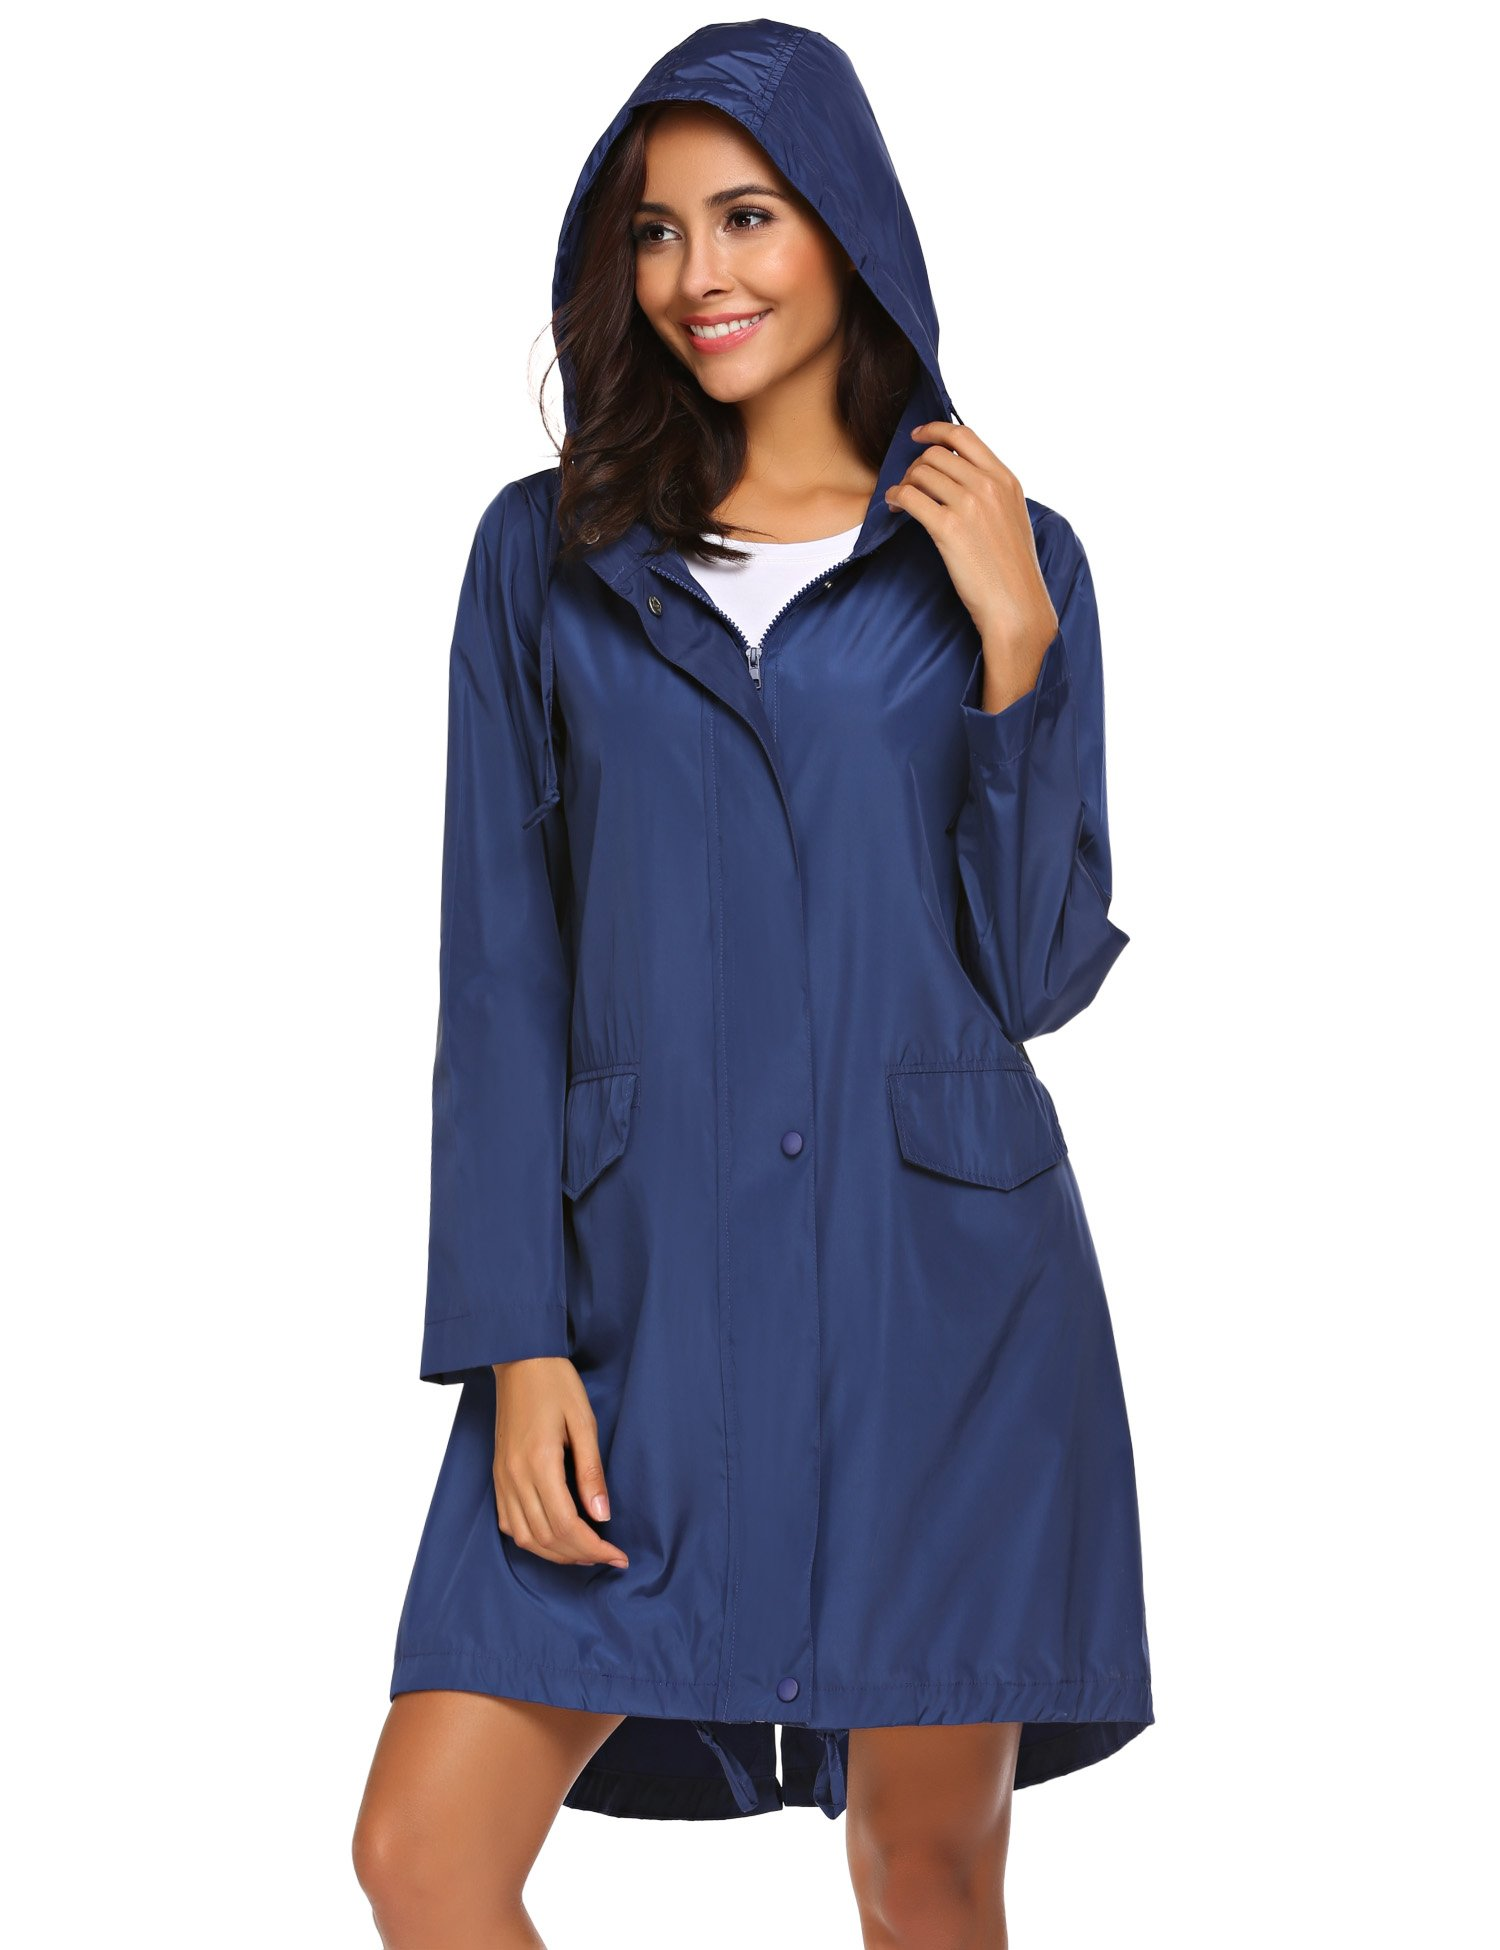 SoTeer Women Lightweight Windbreaker Waterproof Long Rain Hooded Jacket with Drawstring (Navy Blue XL) by SoTeer